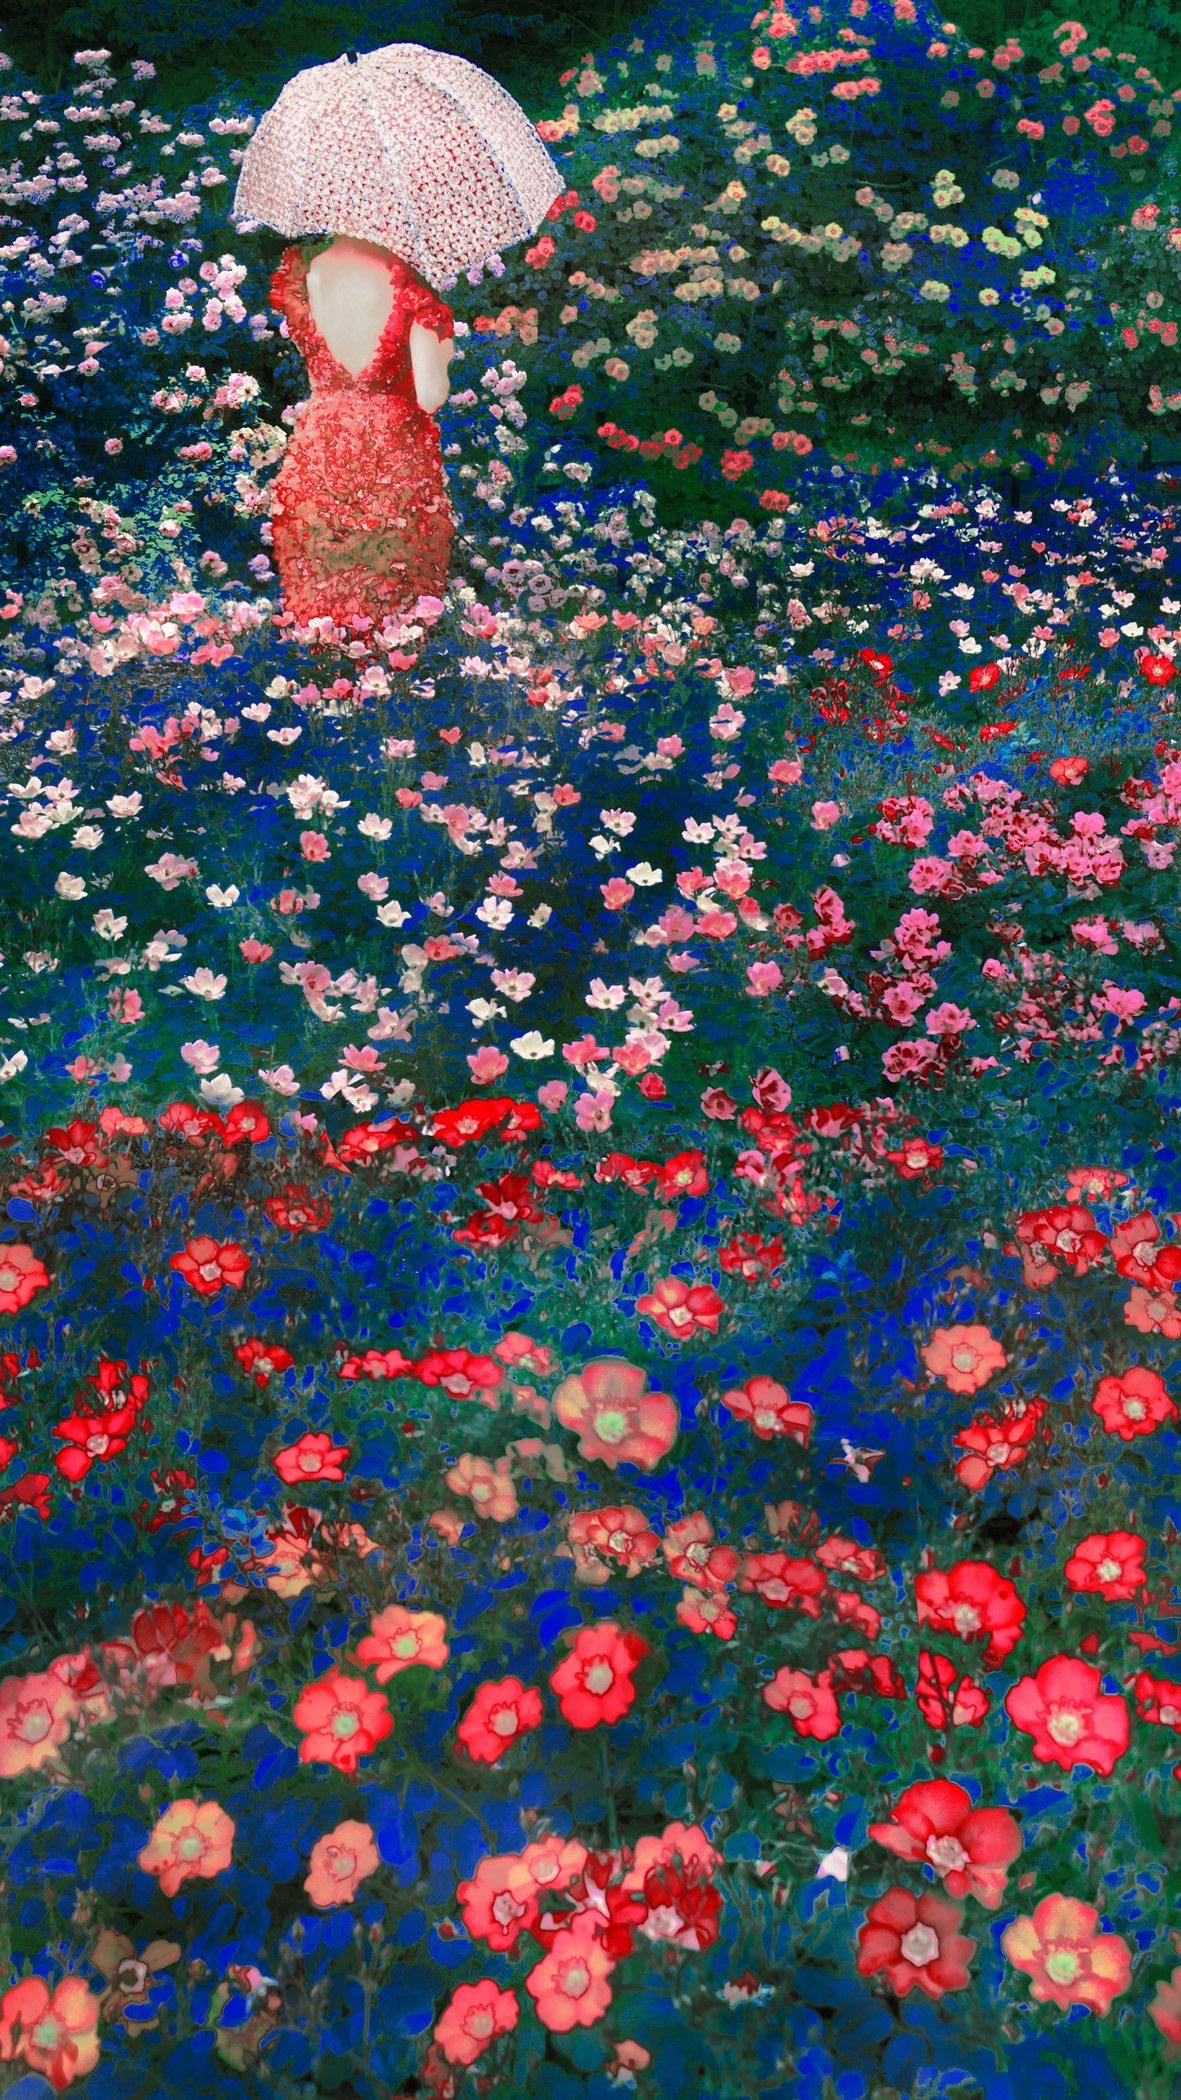 The Garden - 美国摄影师 Erik Madigan Heck 作品:花园